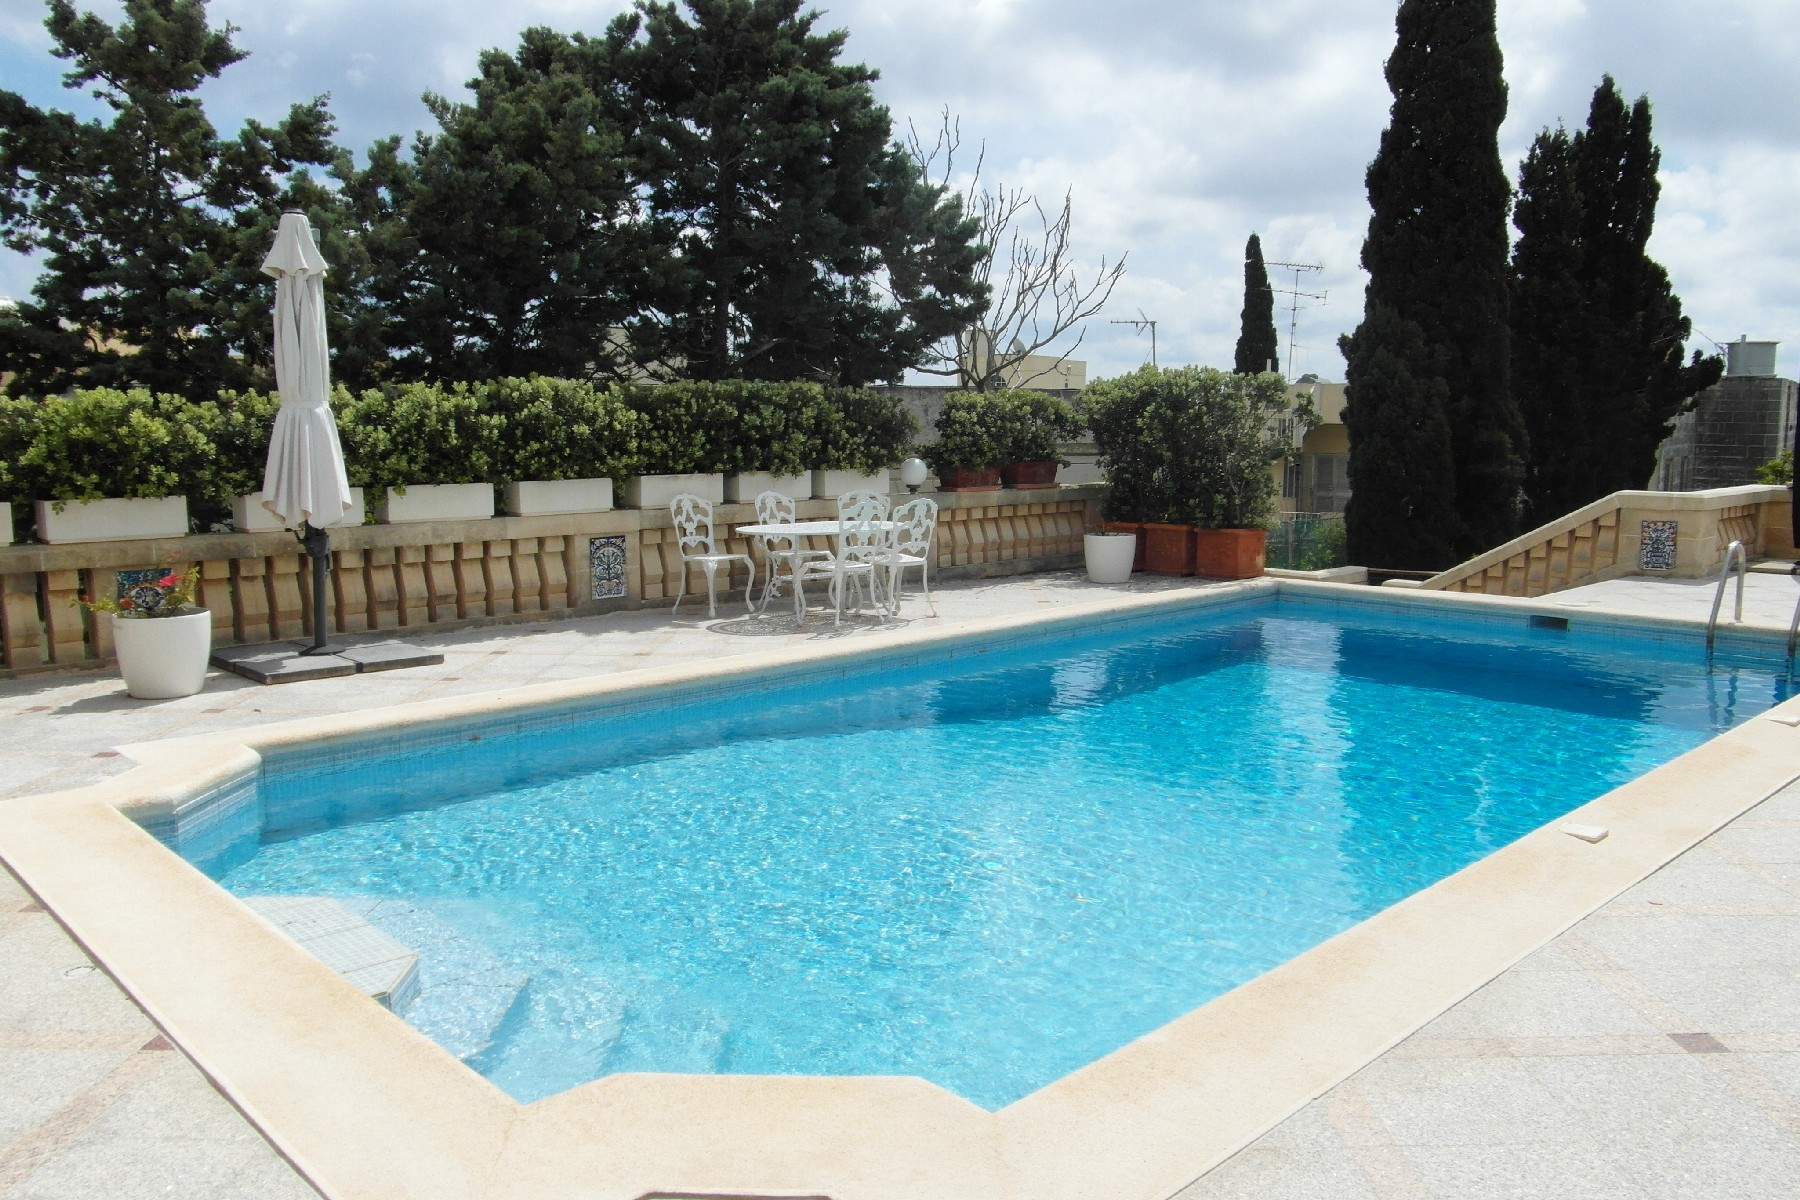 Single Family Home for Rent at Lovely Fully Detached Villa Kappara, San Gwann, Malta